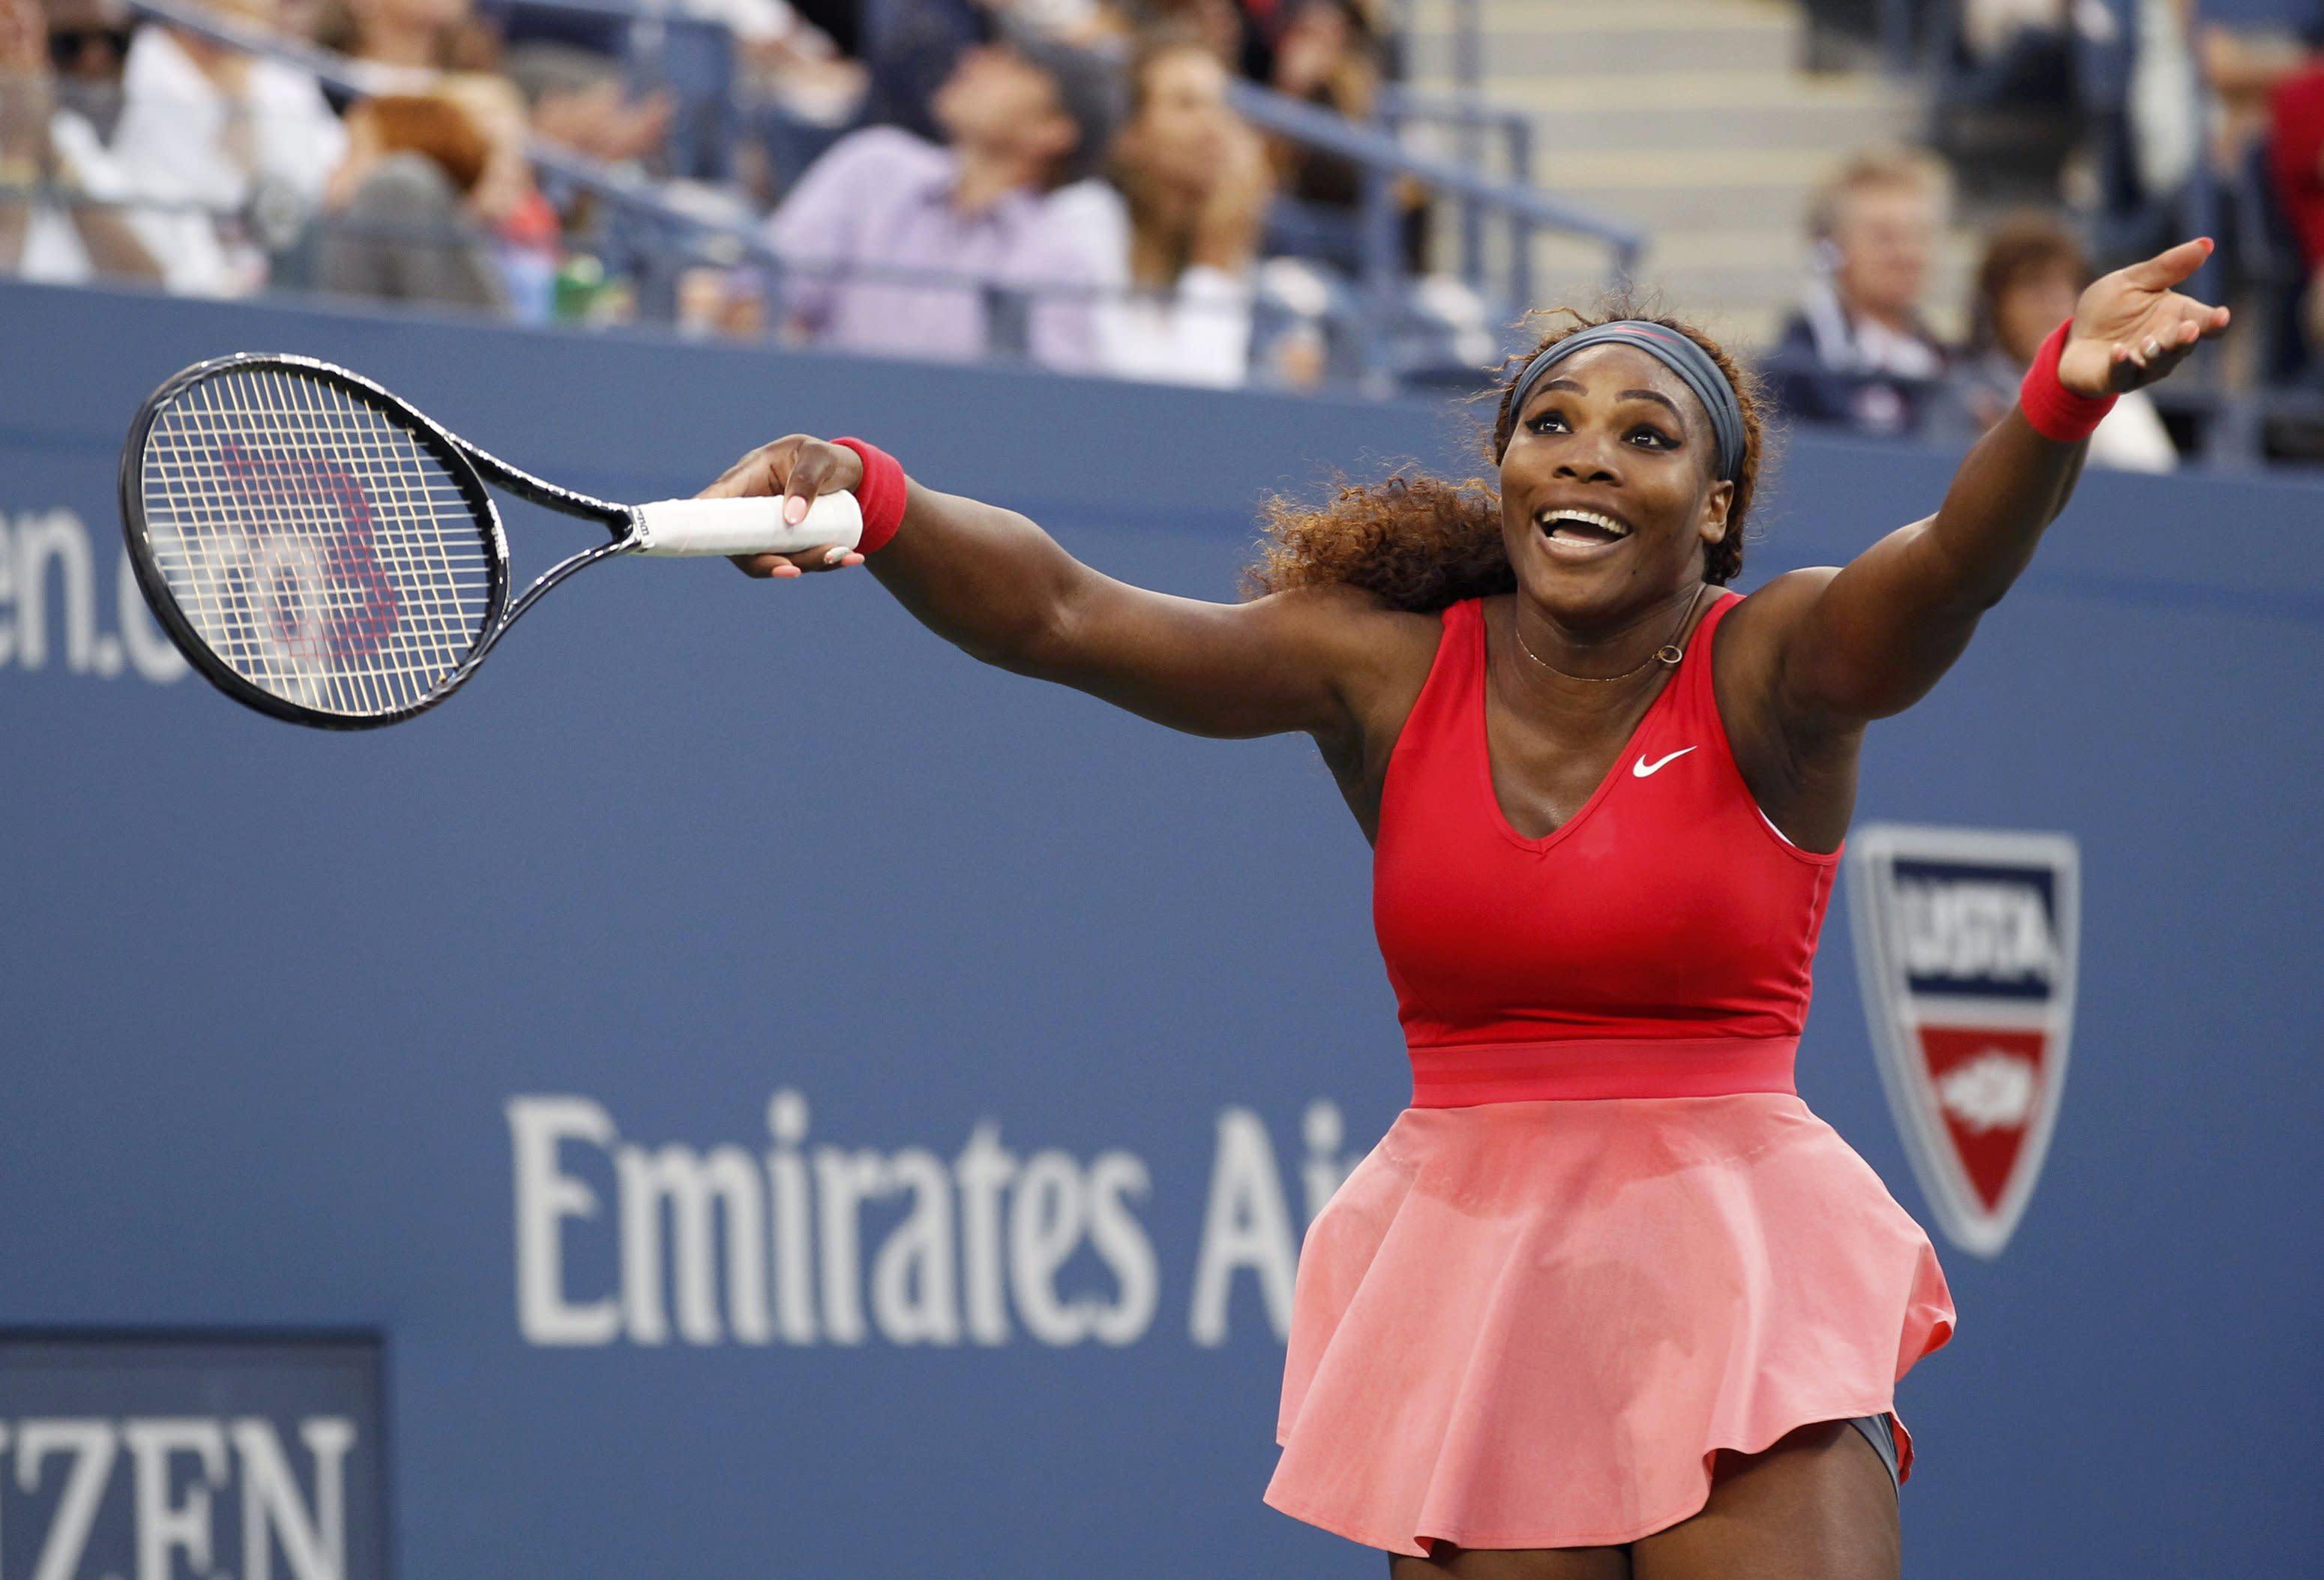 US Open women's final - Williams vs. Azarenka